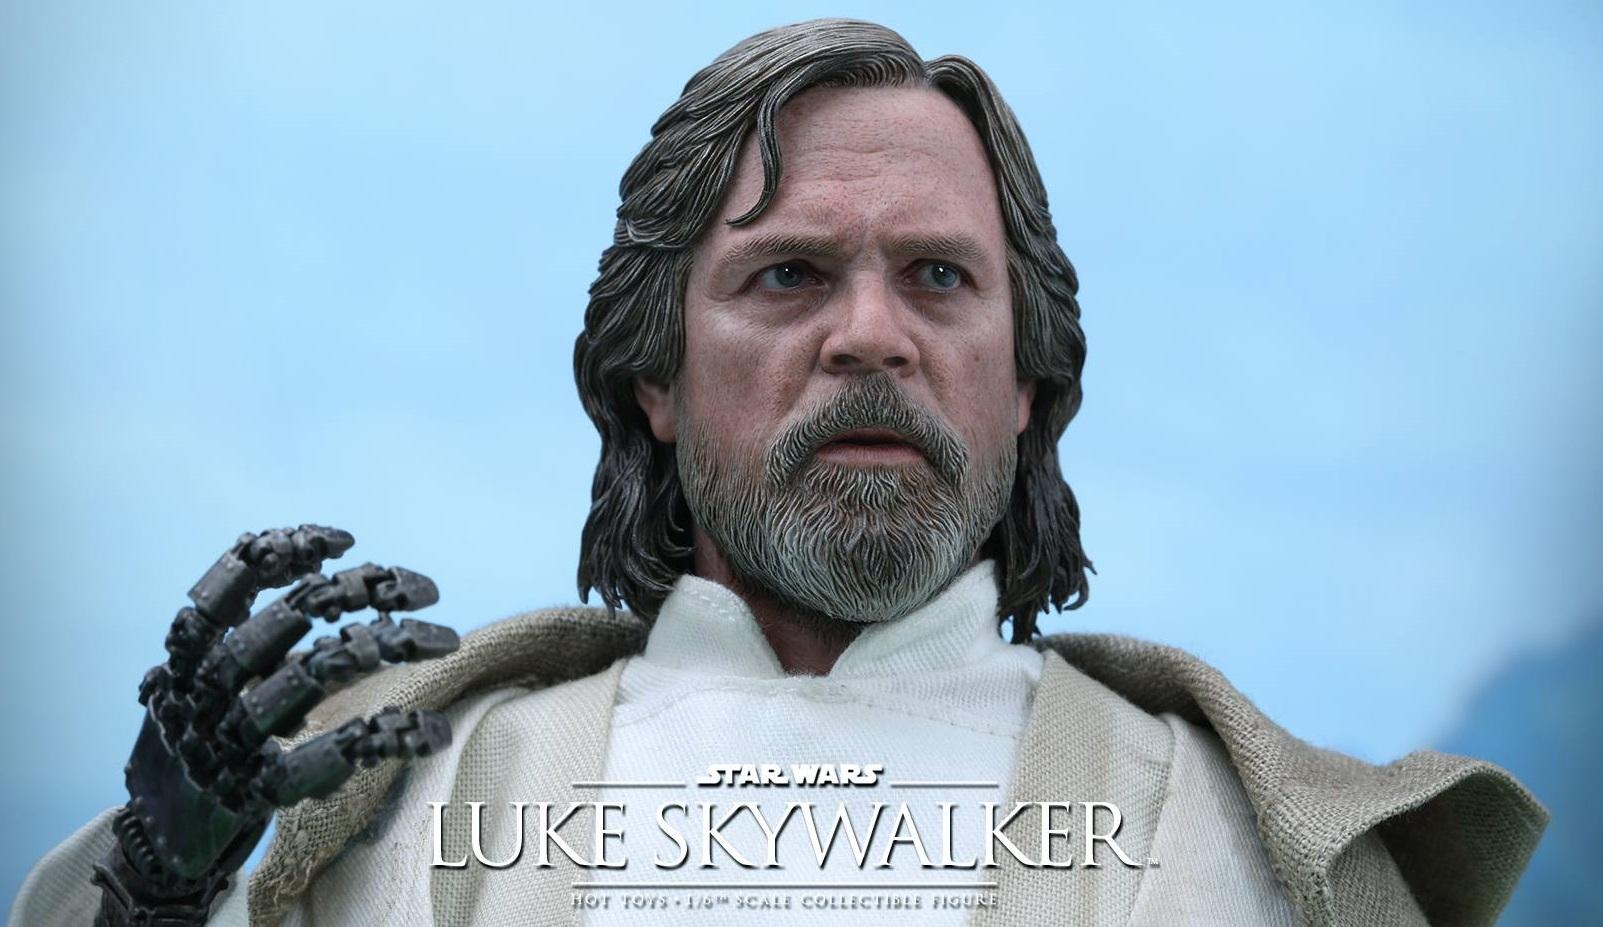 Hot Toys Luke Skywalker aus The Force Awakens in 1/6 Scale